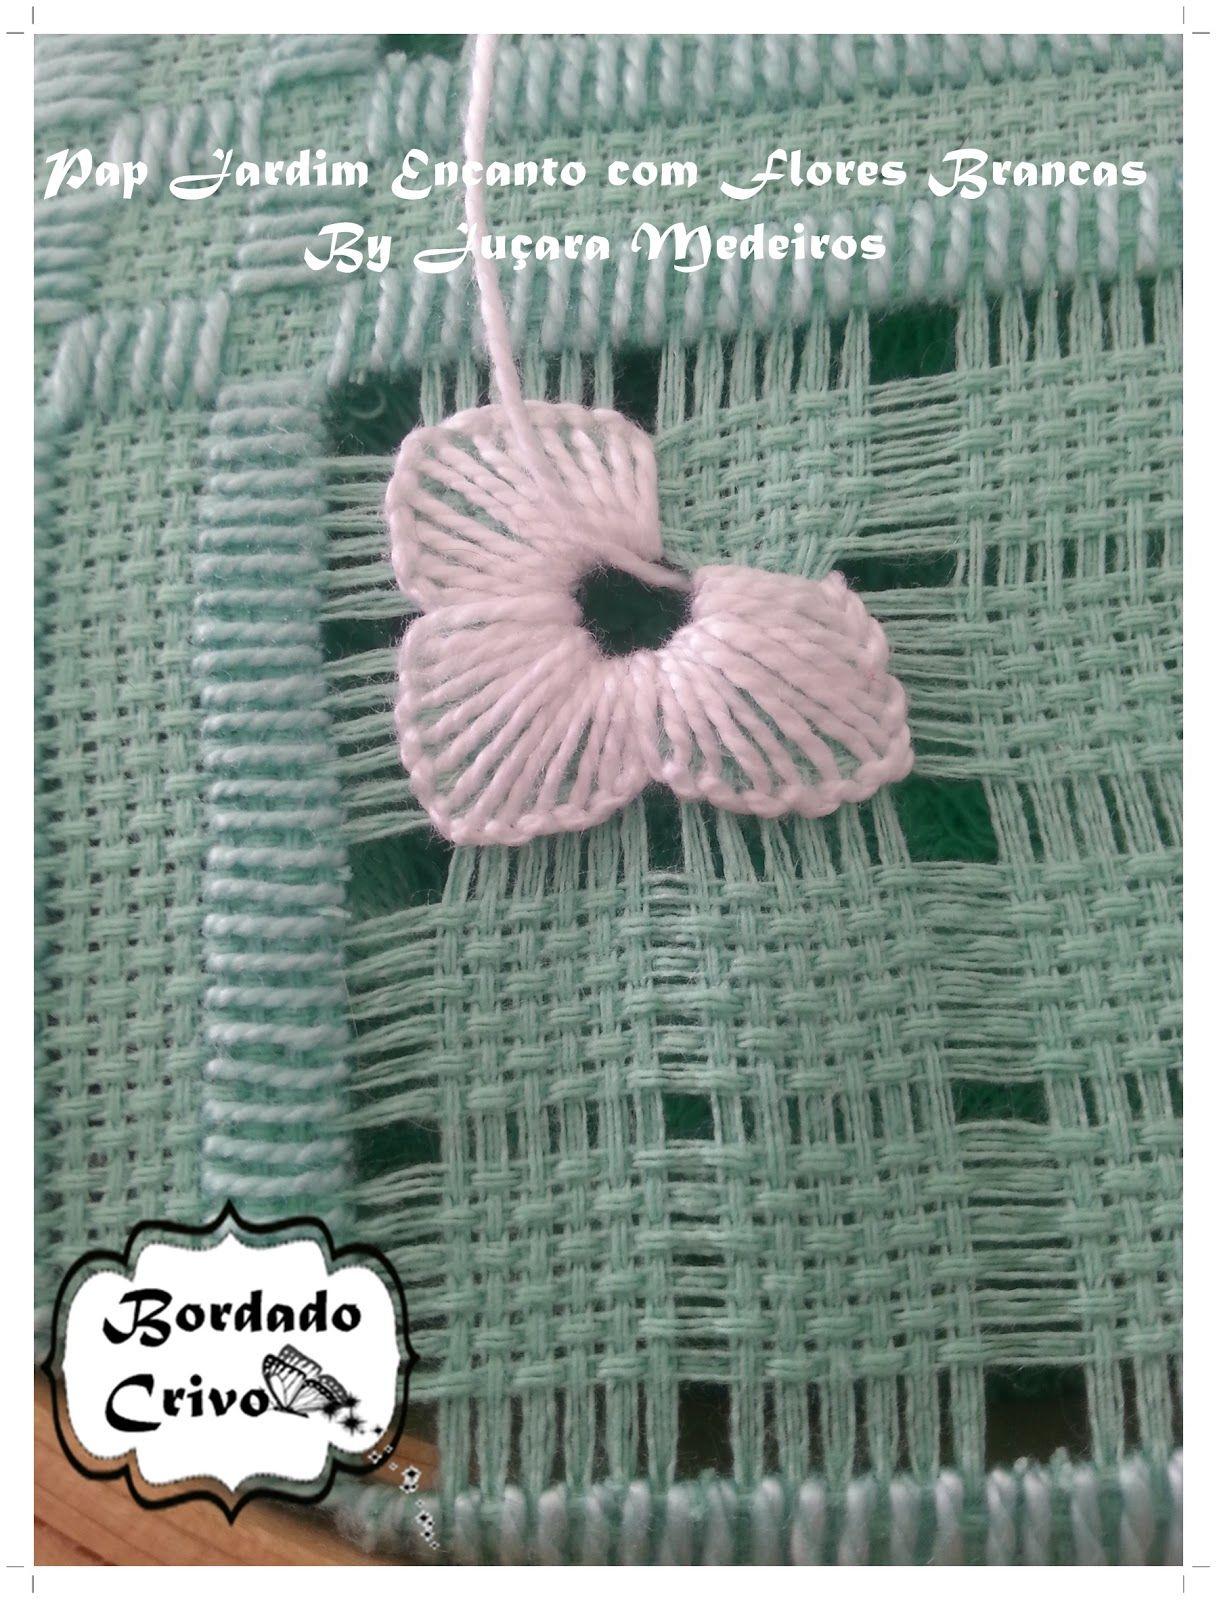 Pap de bordado | crochê da lili | Pinterest | Kunst Ideen ...